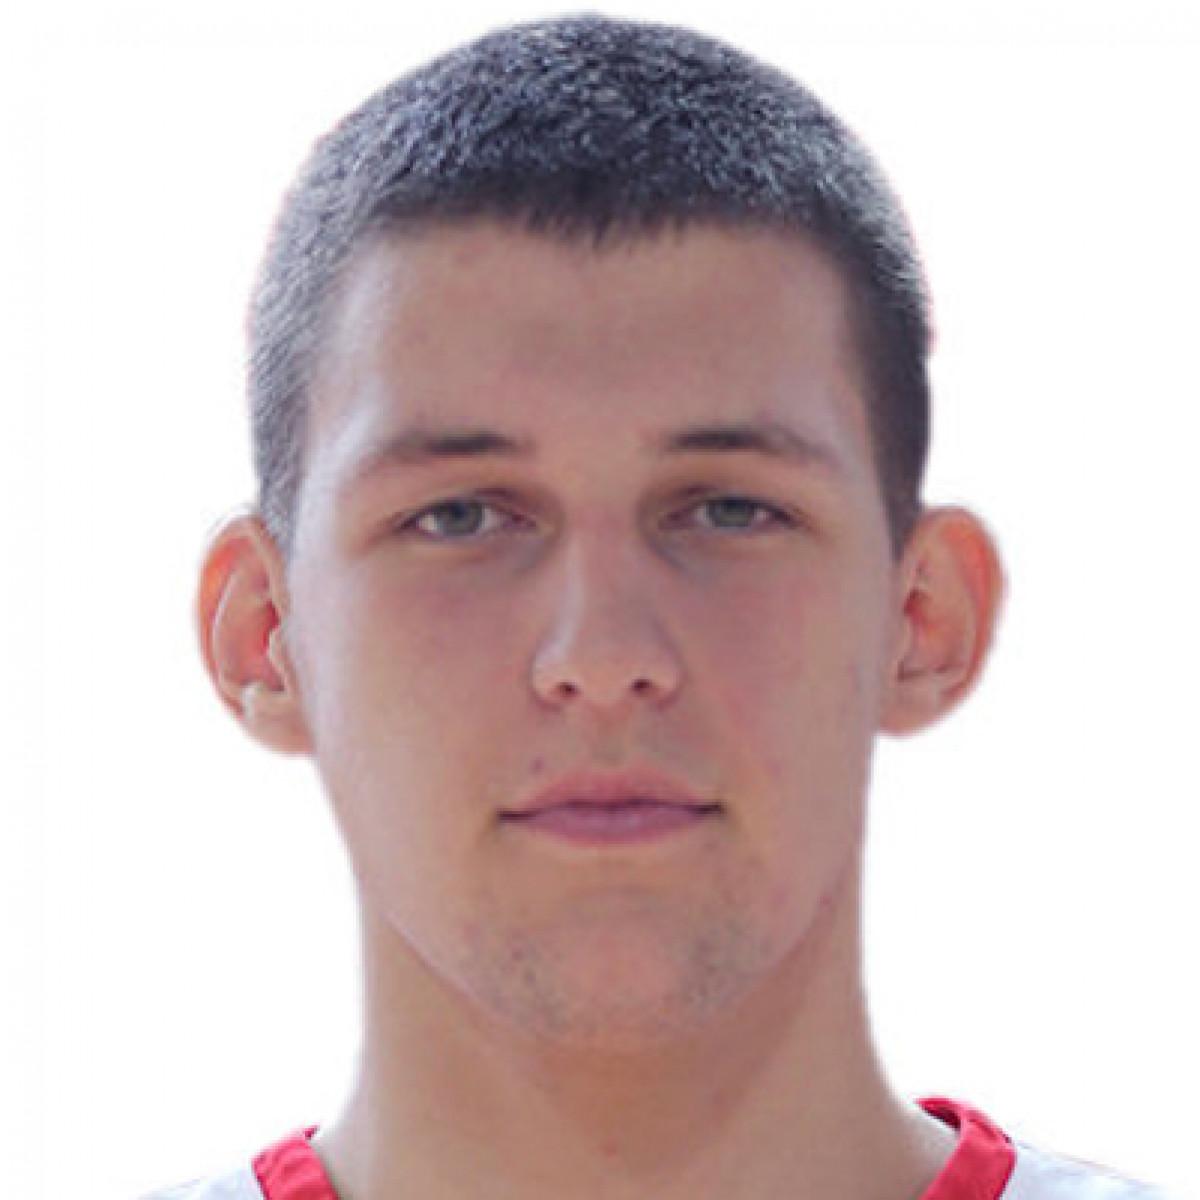 Lazar Joksimovic